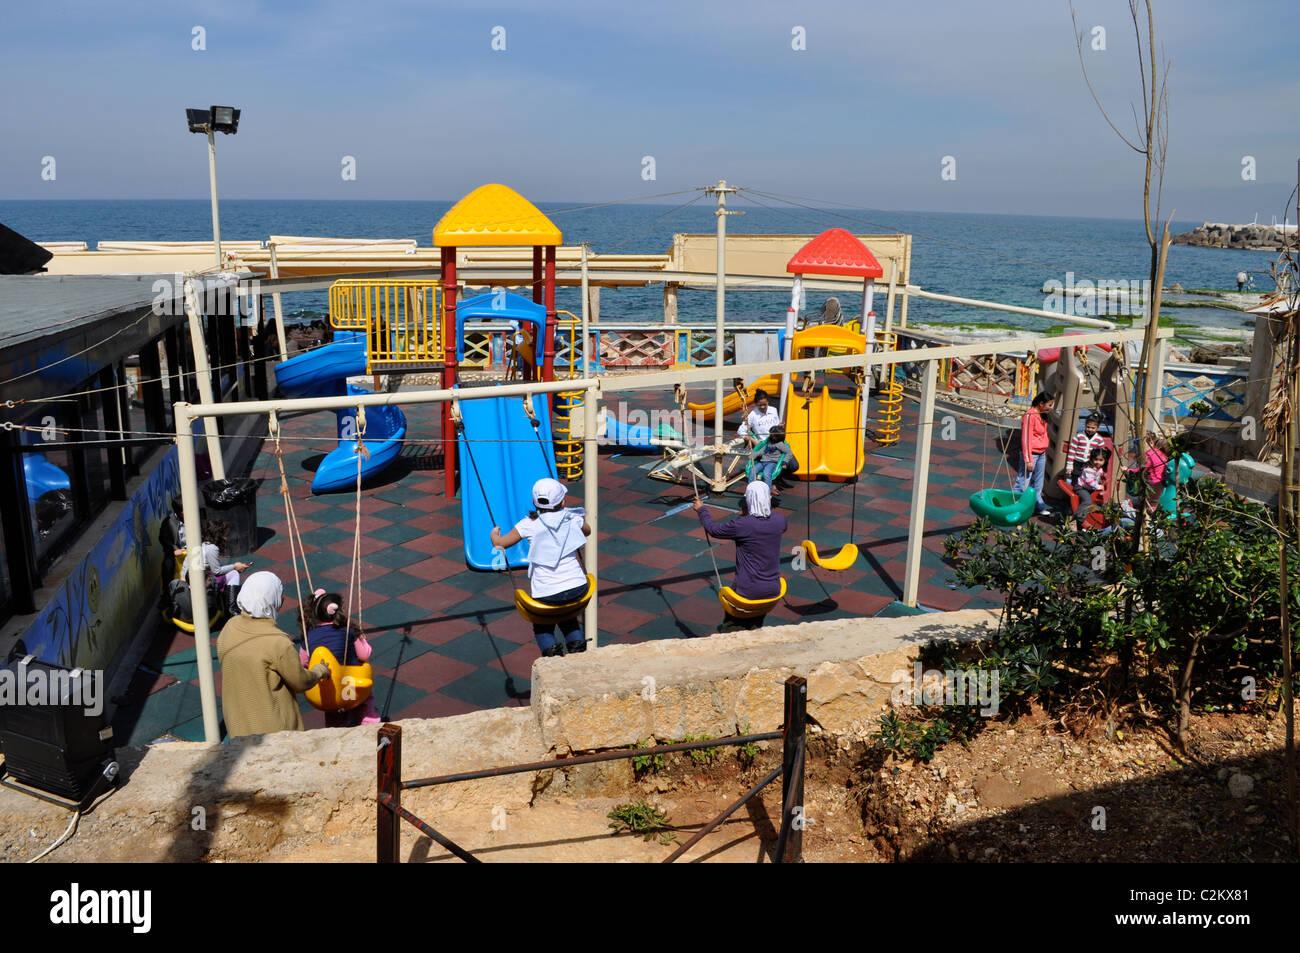 Manara, Beirut, Lebanon. Mediterranean cafe, Muslim families. Friday holiday. - Stock Image